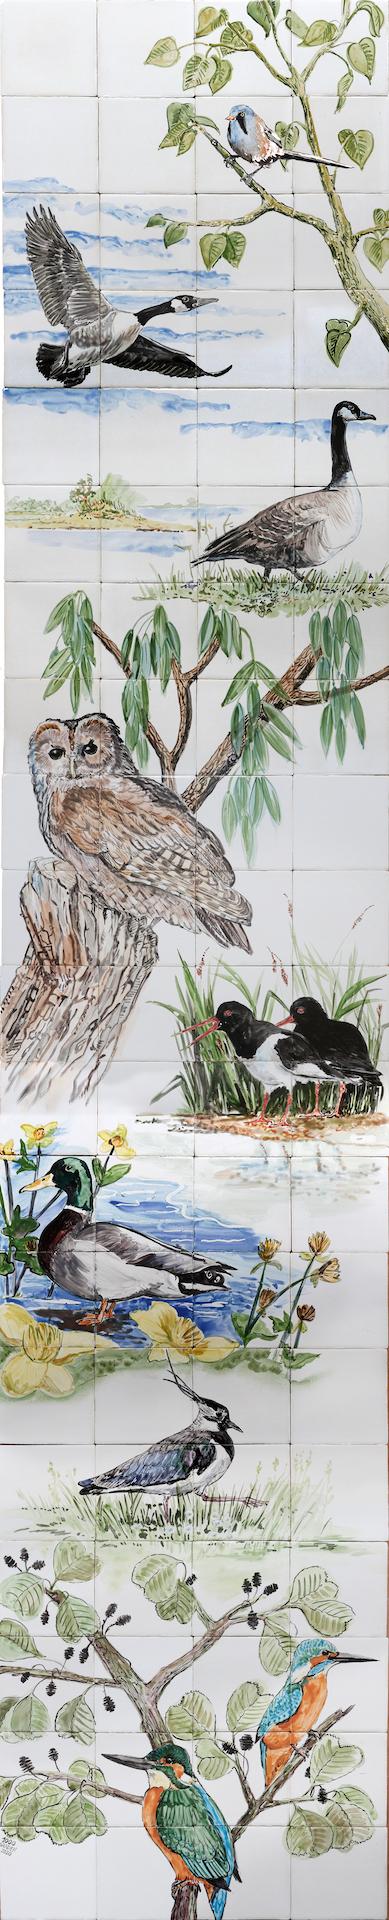 river delta birds tile panel